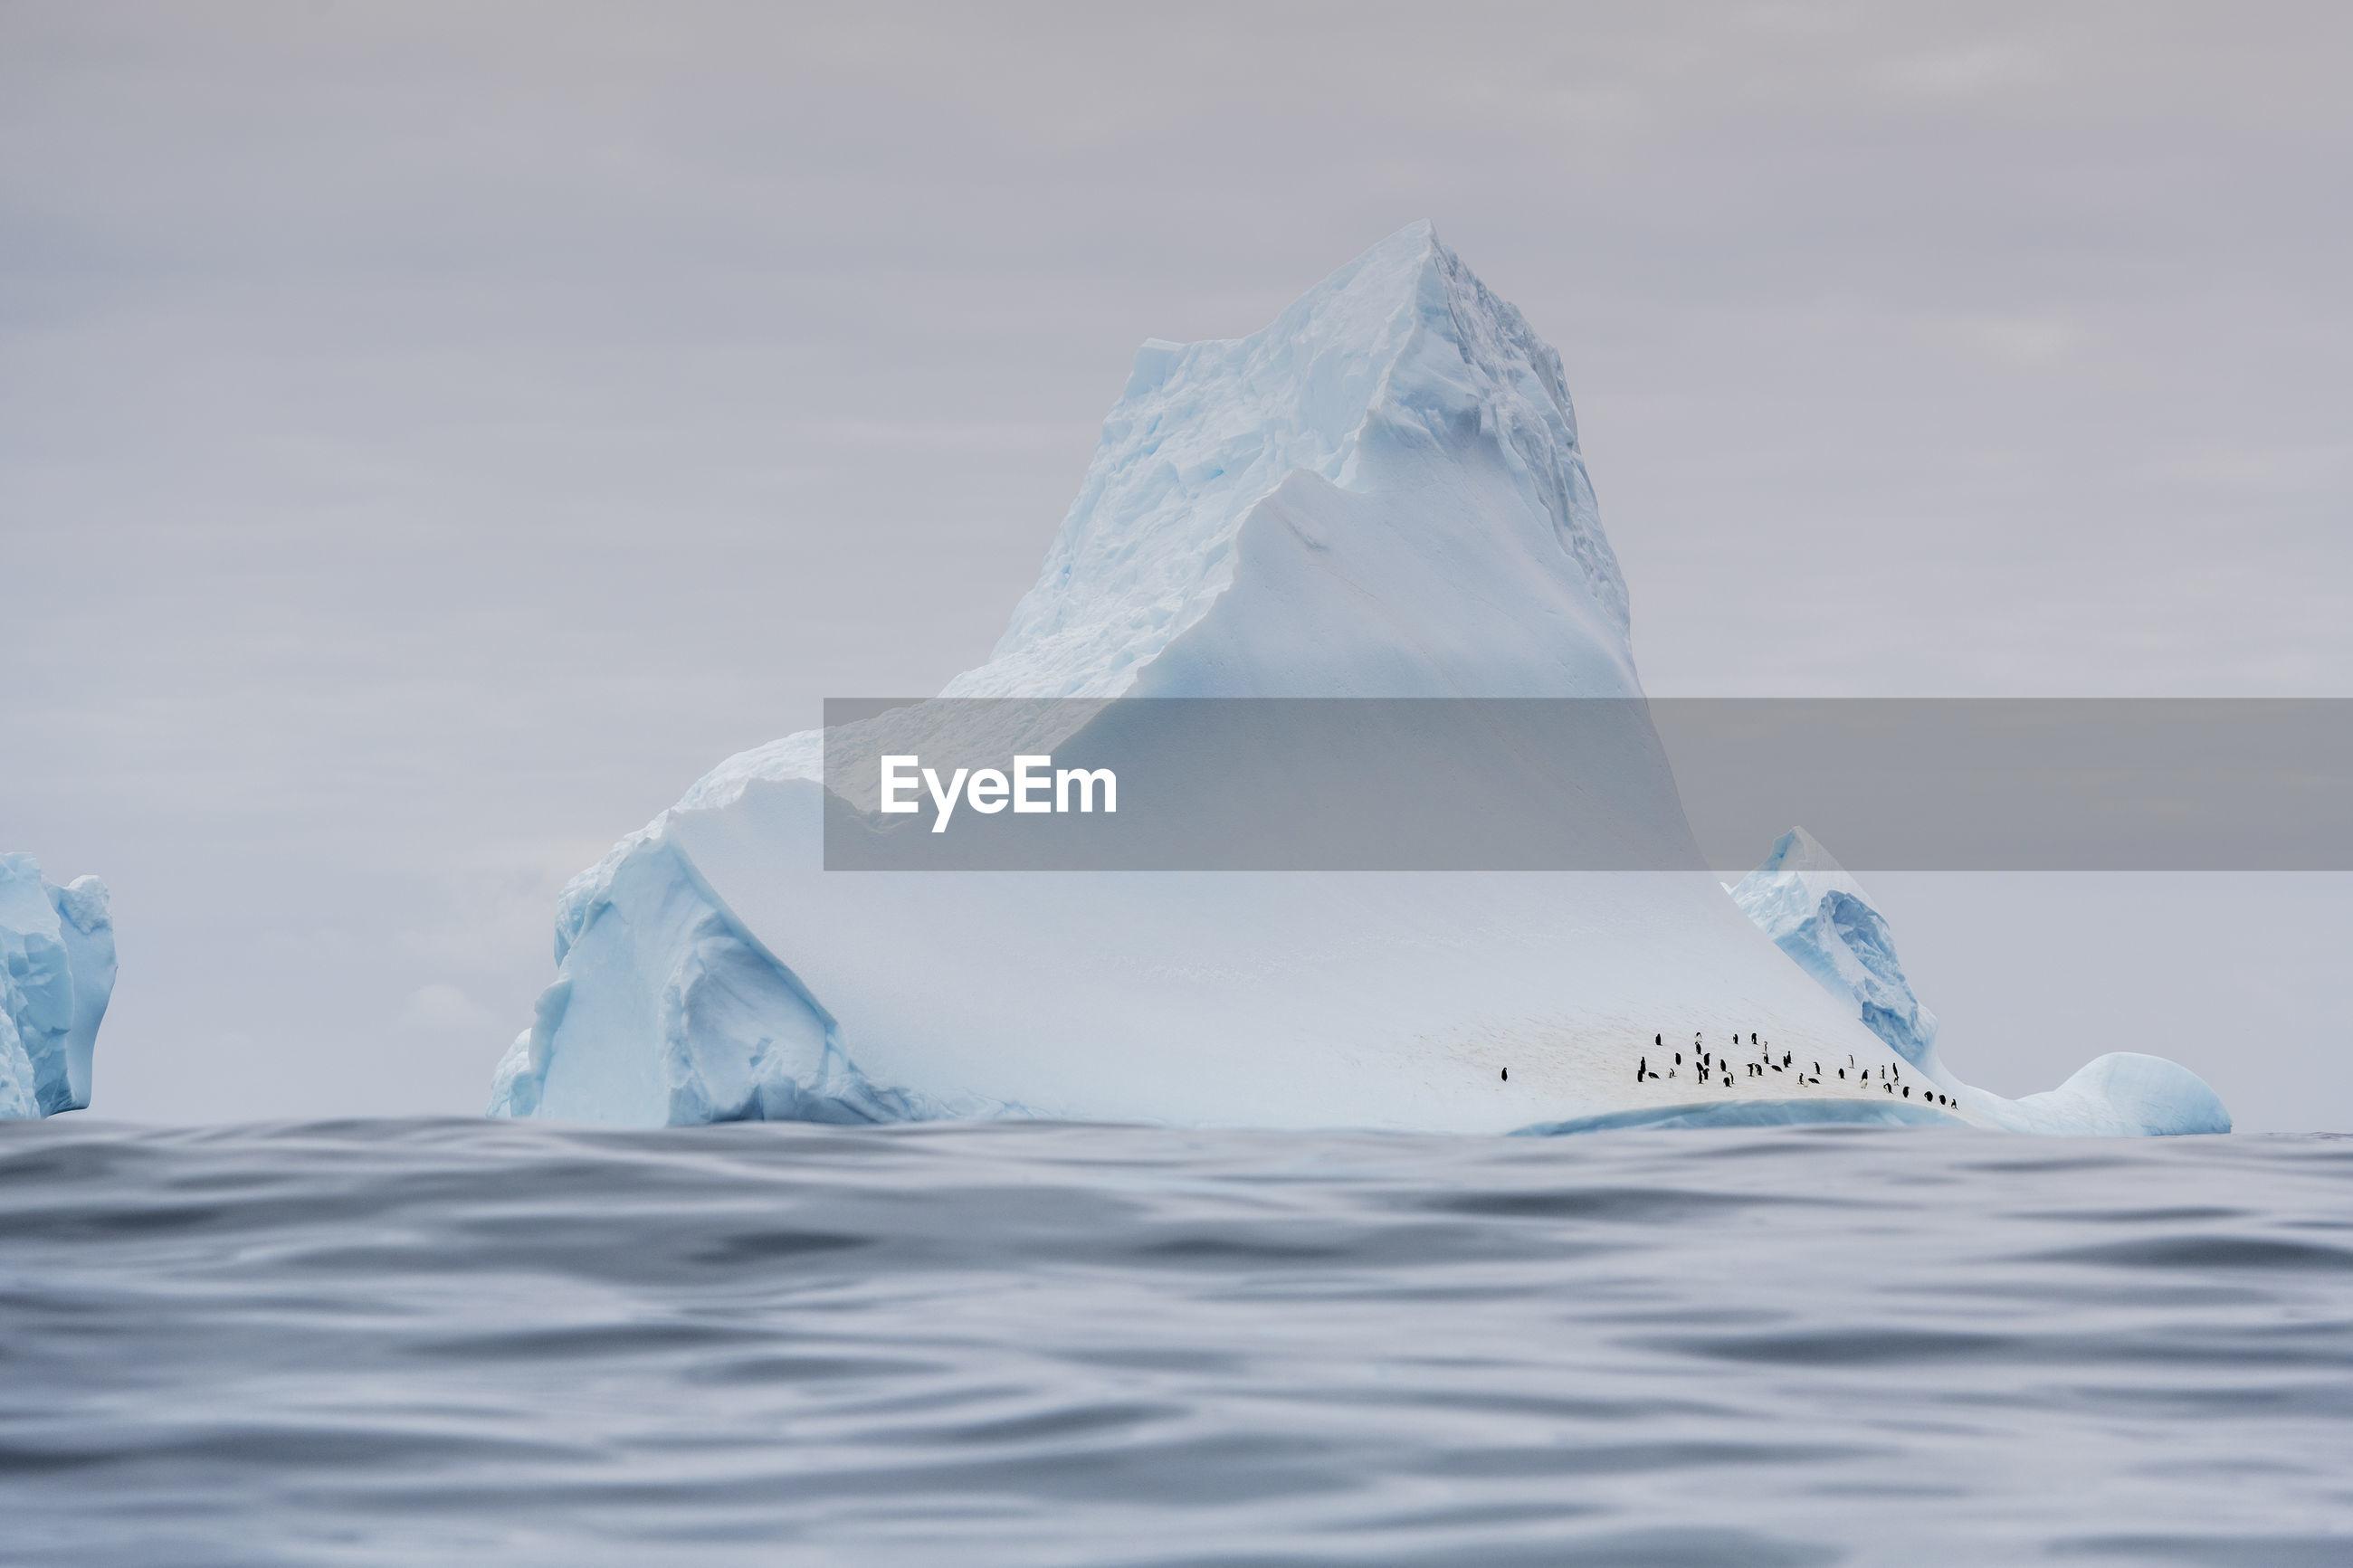 Chinstrap penguins on an iceberg of the coast of elephant island, antarctica.